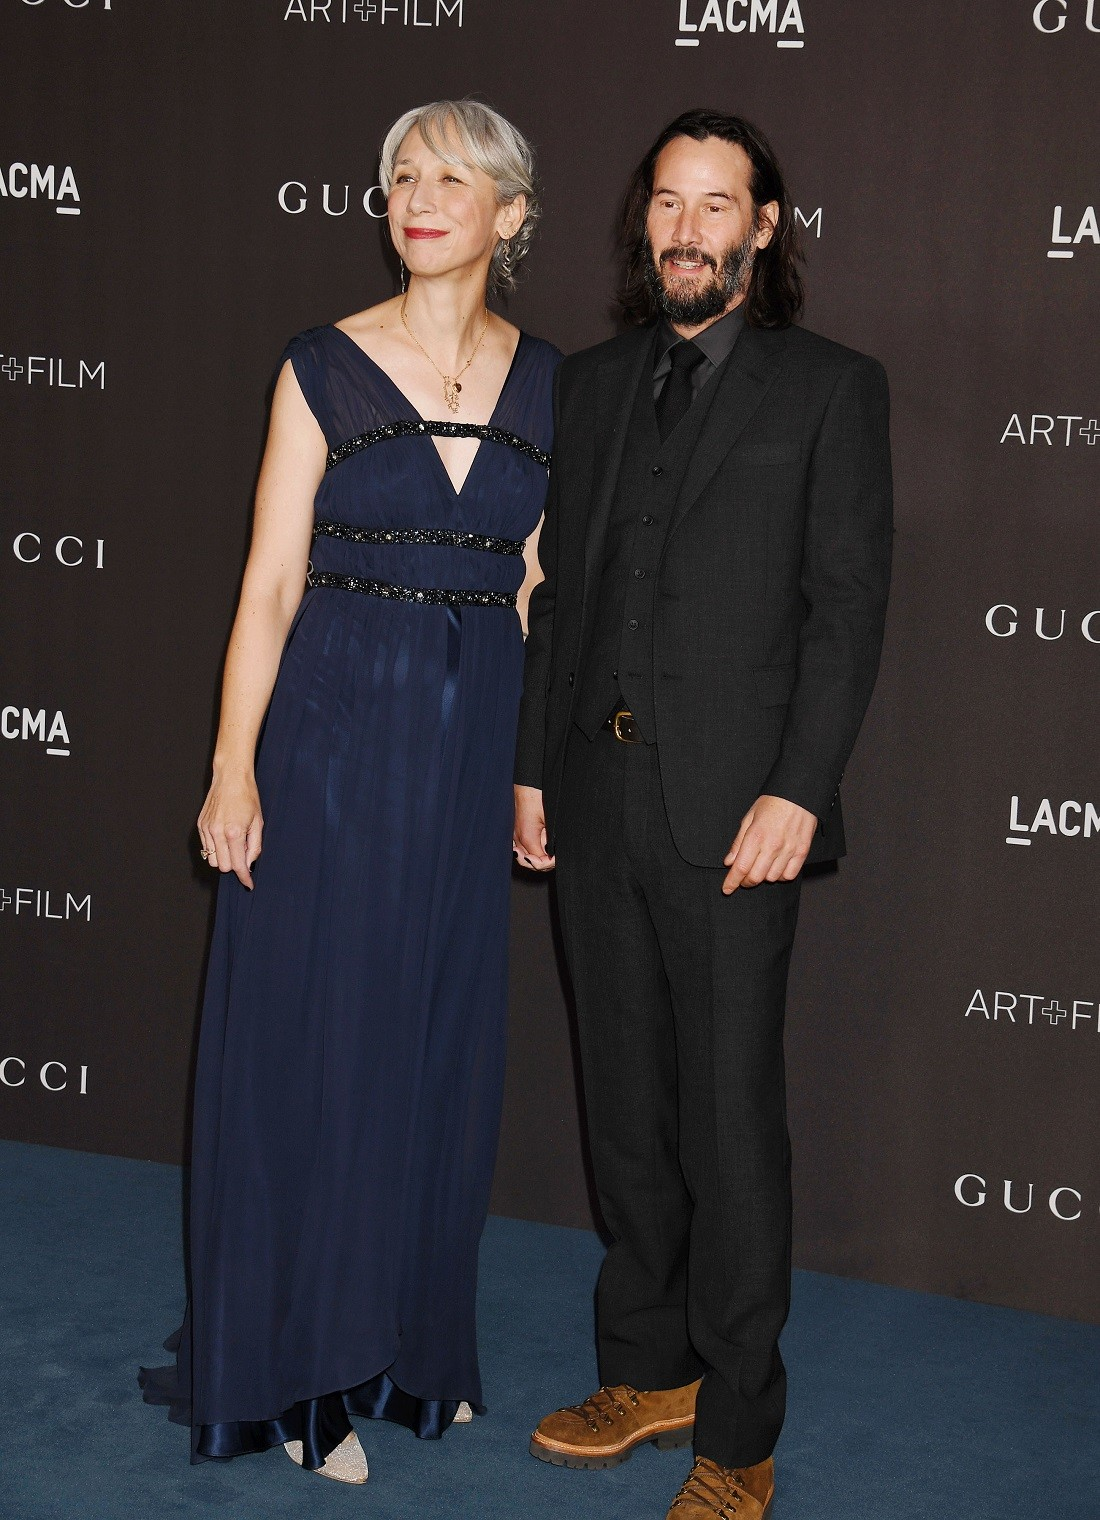 2019 11 08 08 29 57 grant - Η Helen Mirren απαντά: Είναι ή δεν είναι η νέα σύντροφος του Keanu Reeves;